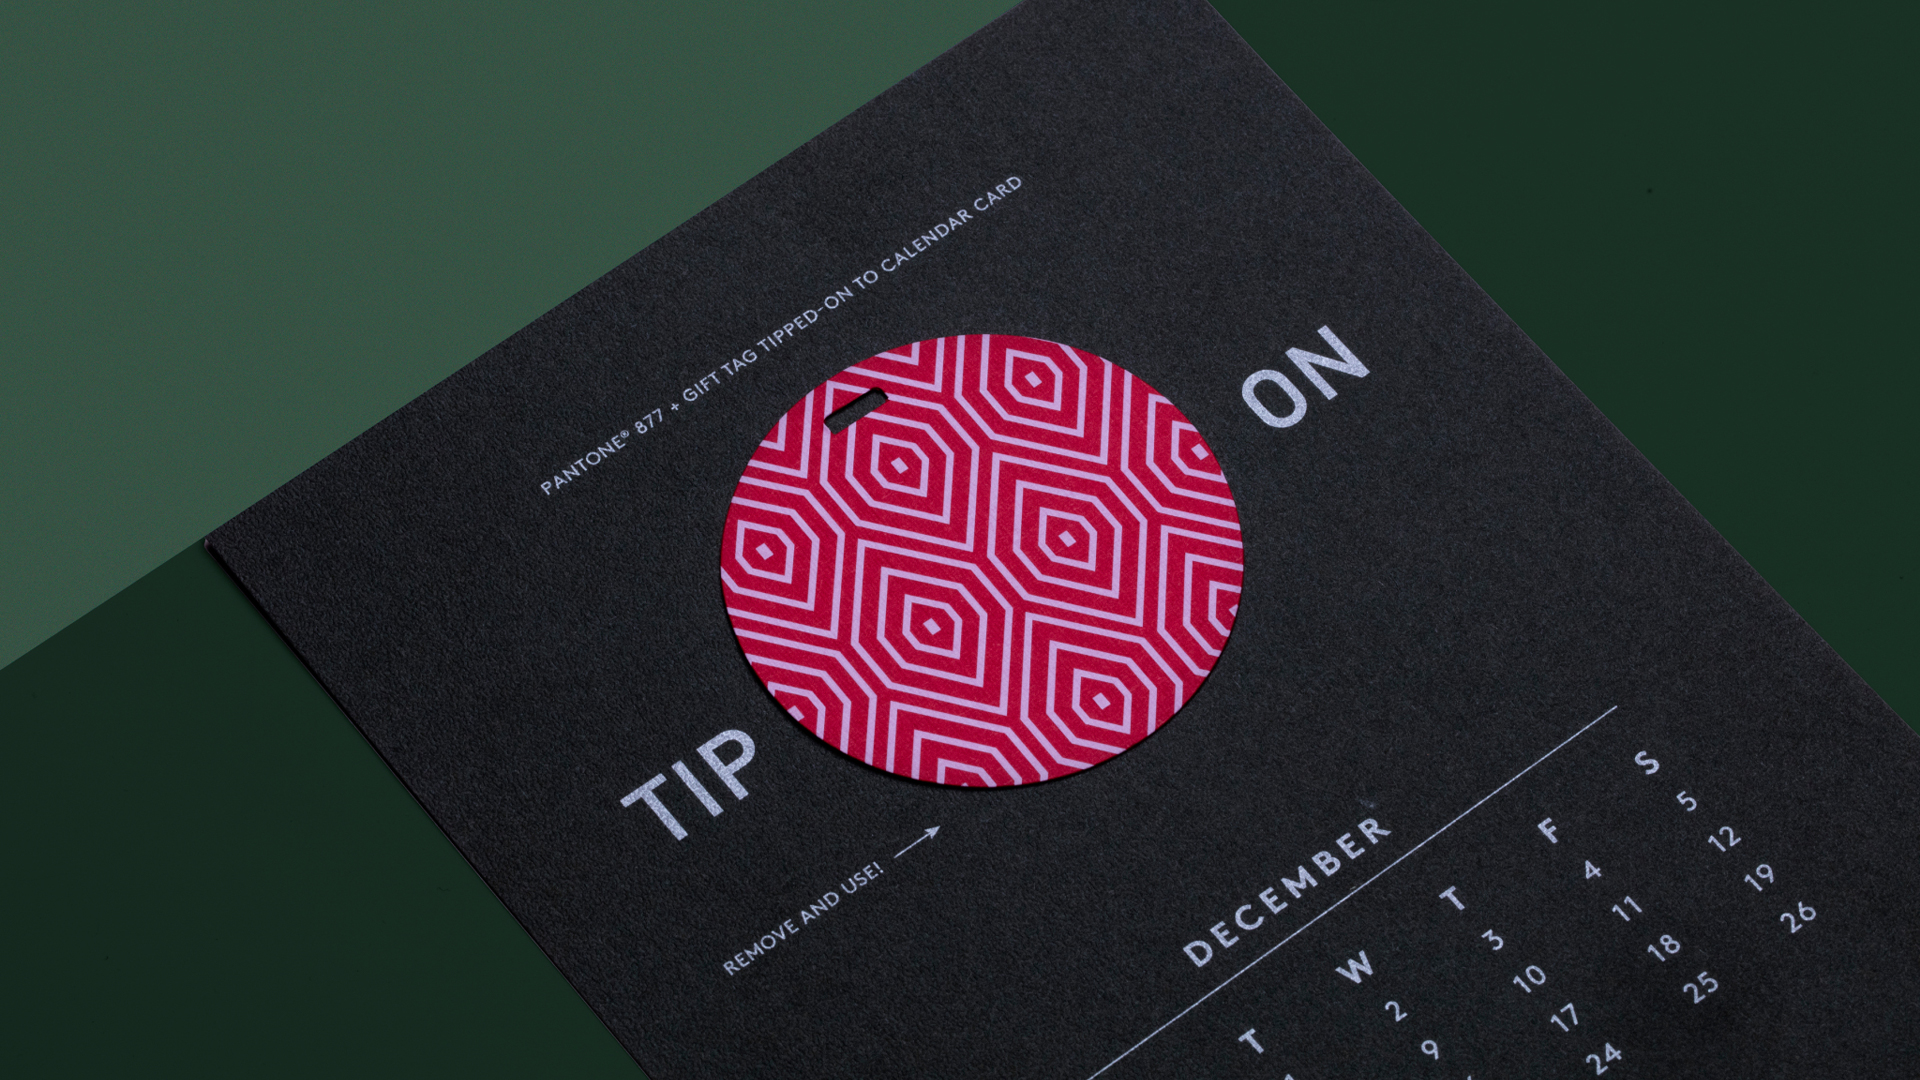 Neenah Classic 2020 Calendar - PaperSpecs